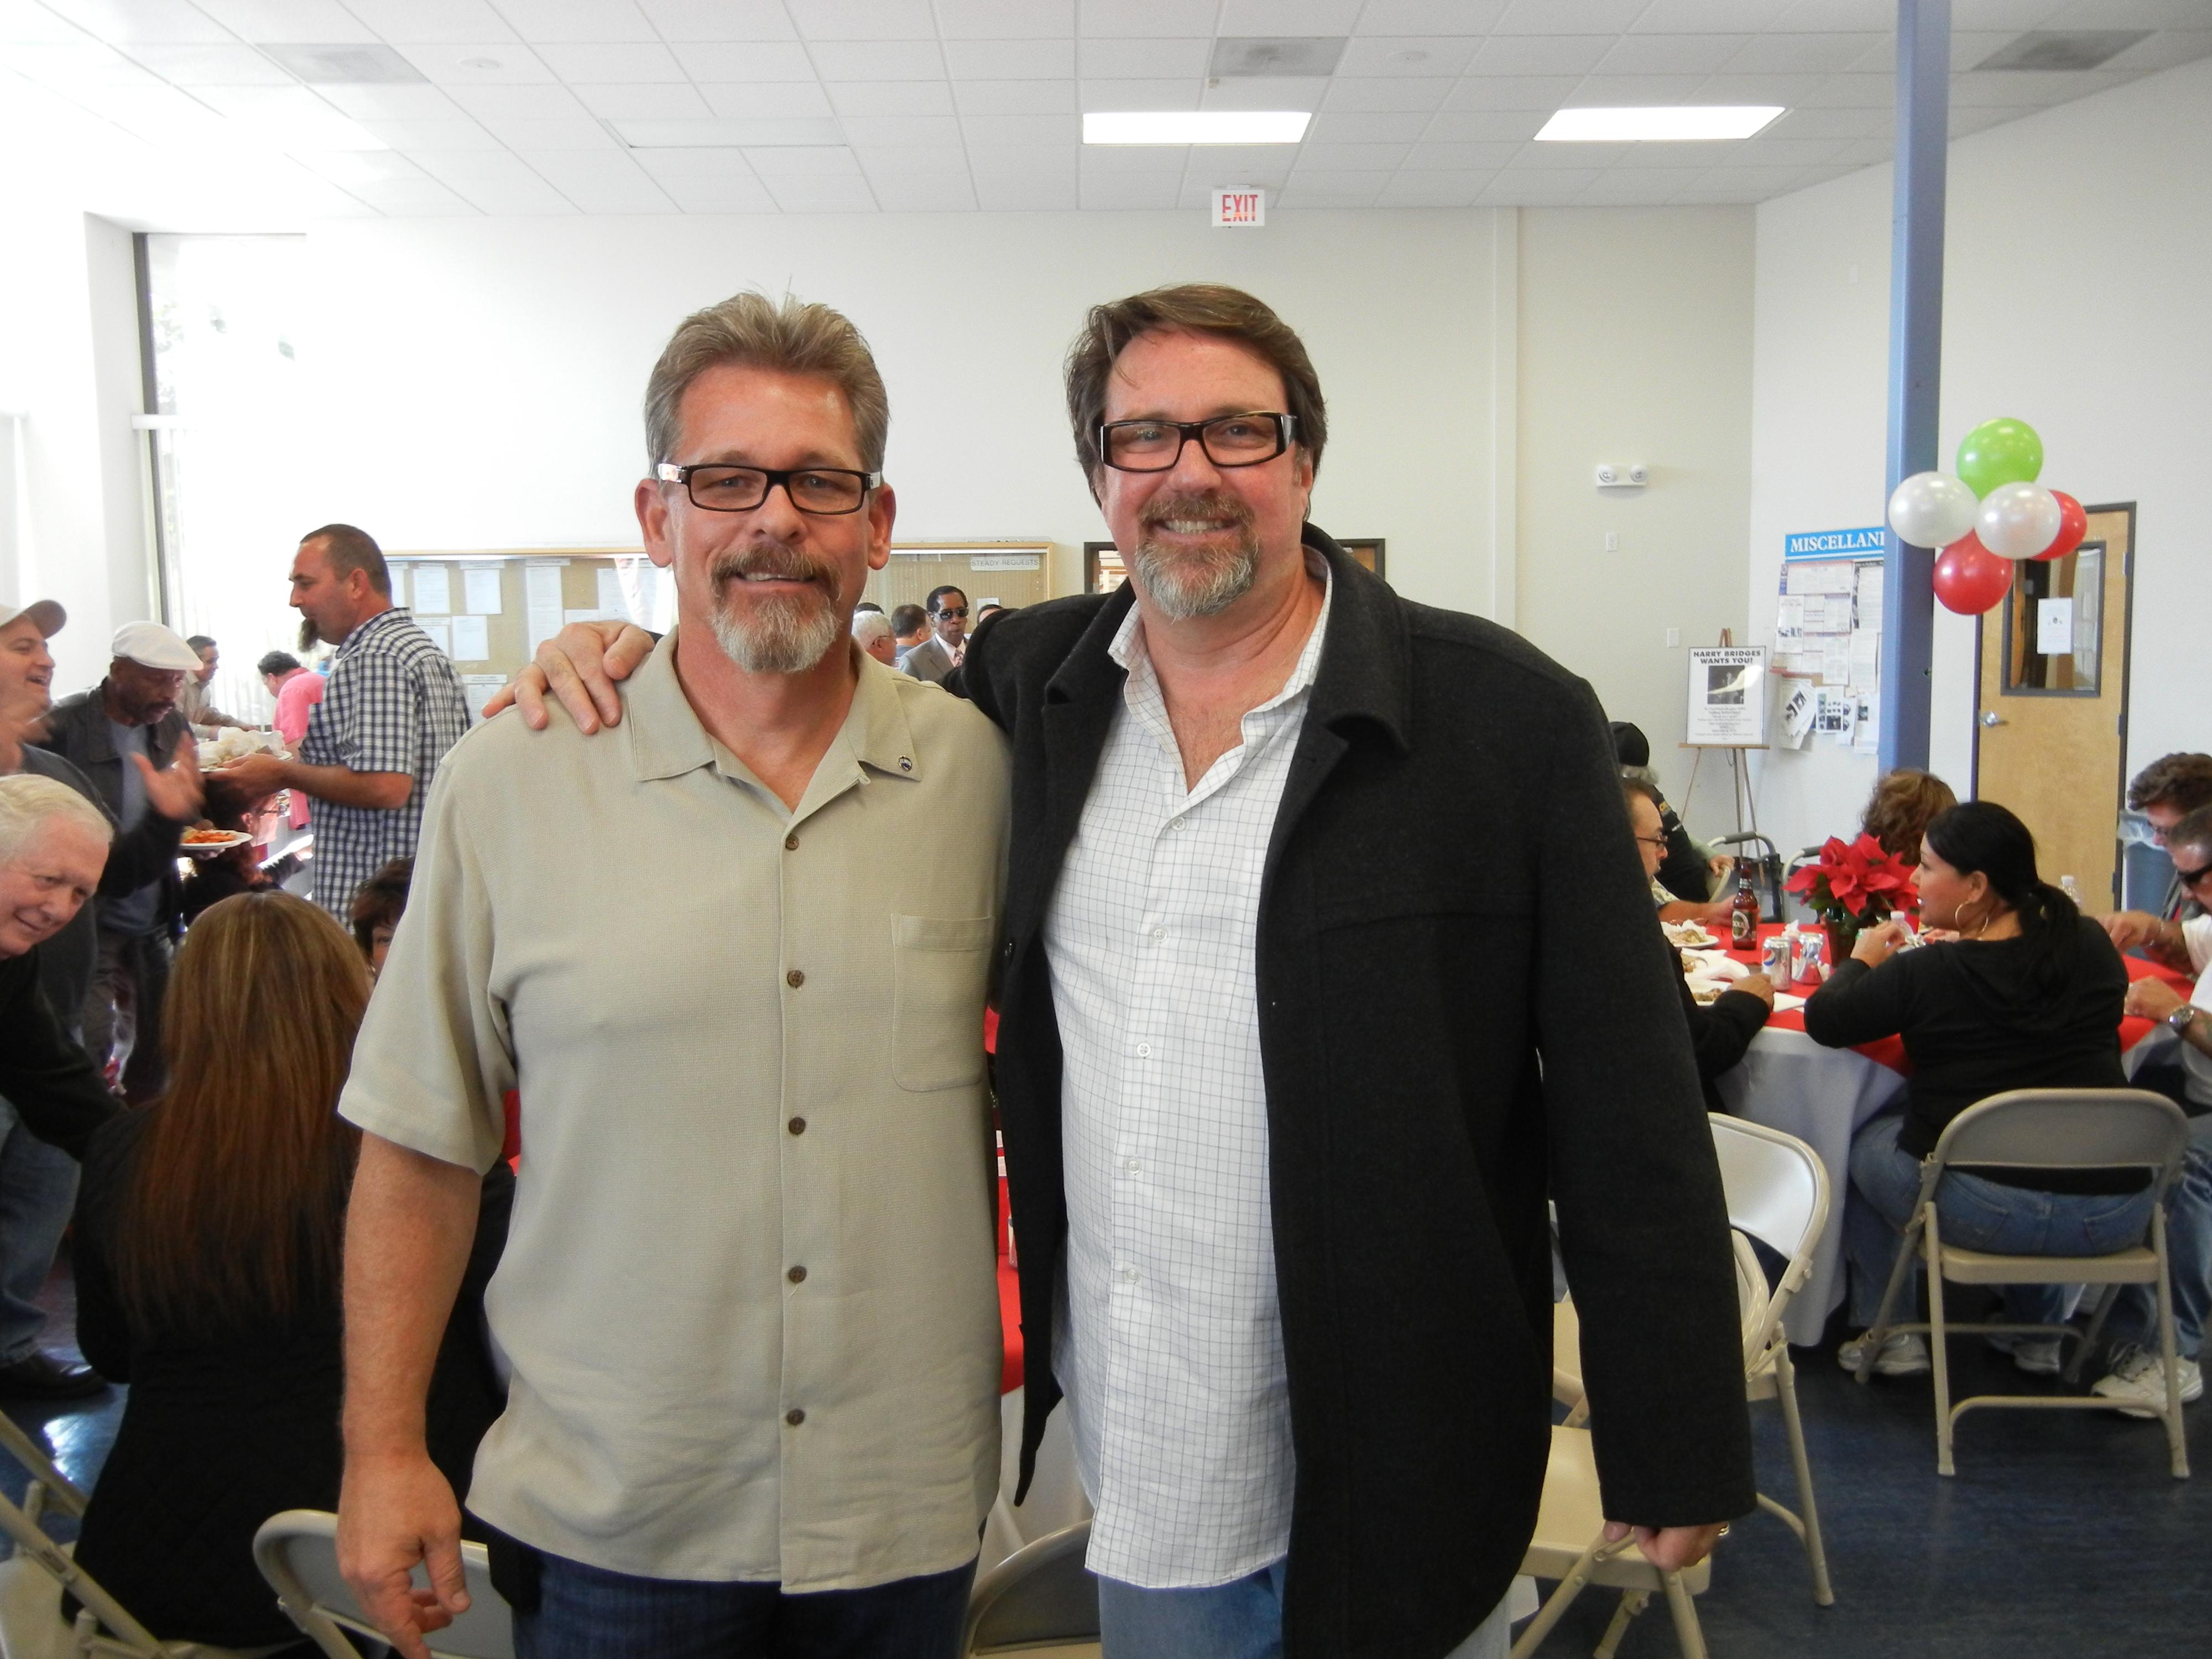 Mike Podue and Peter Peyton